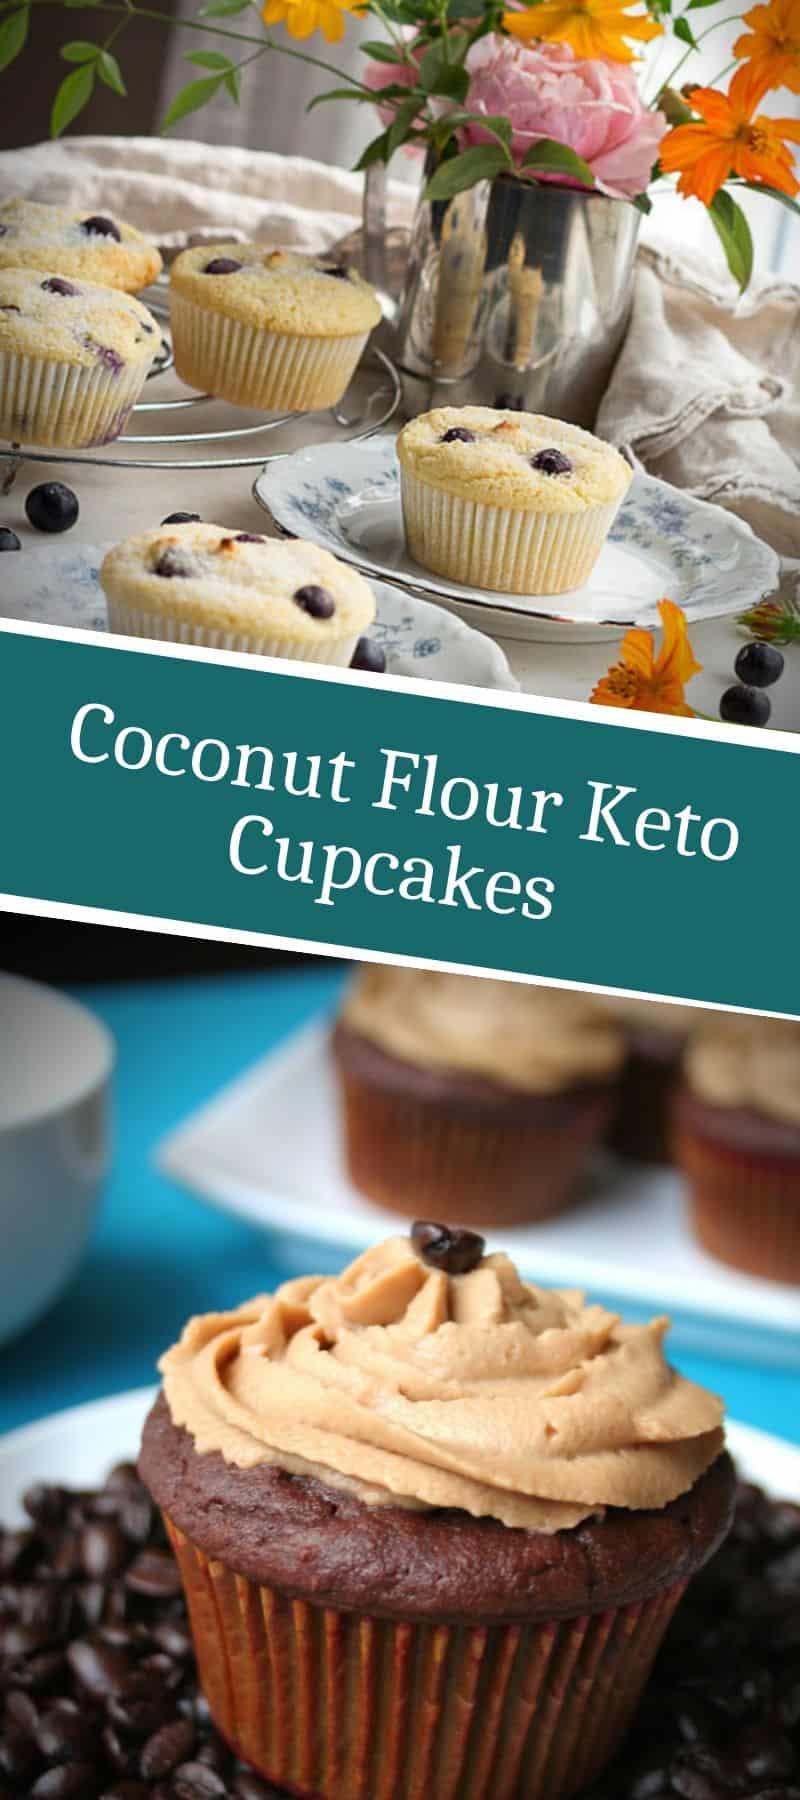 Coconut Flour Keto Cupcakes 3